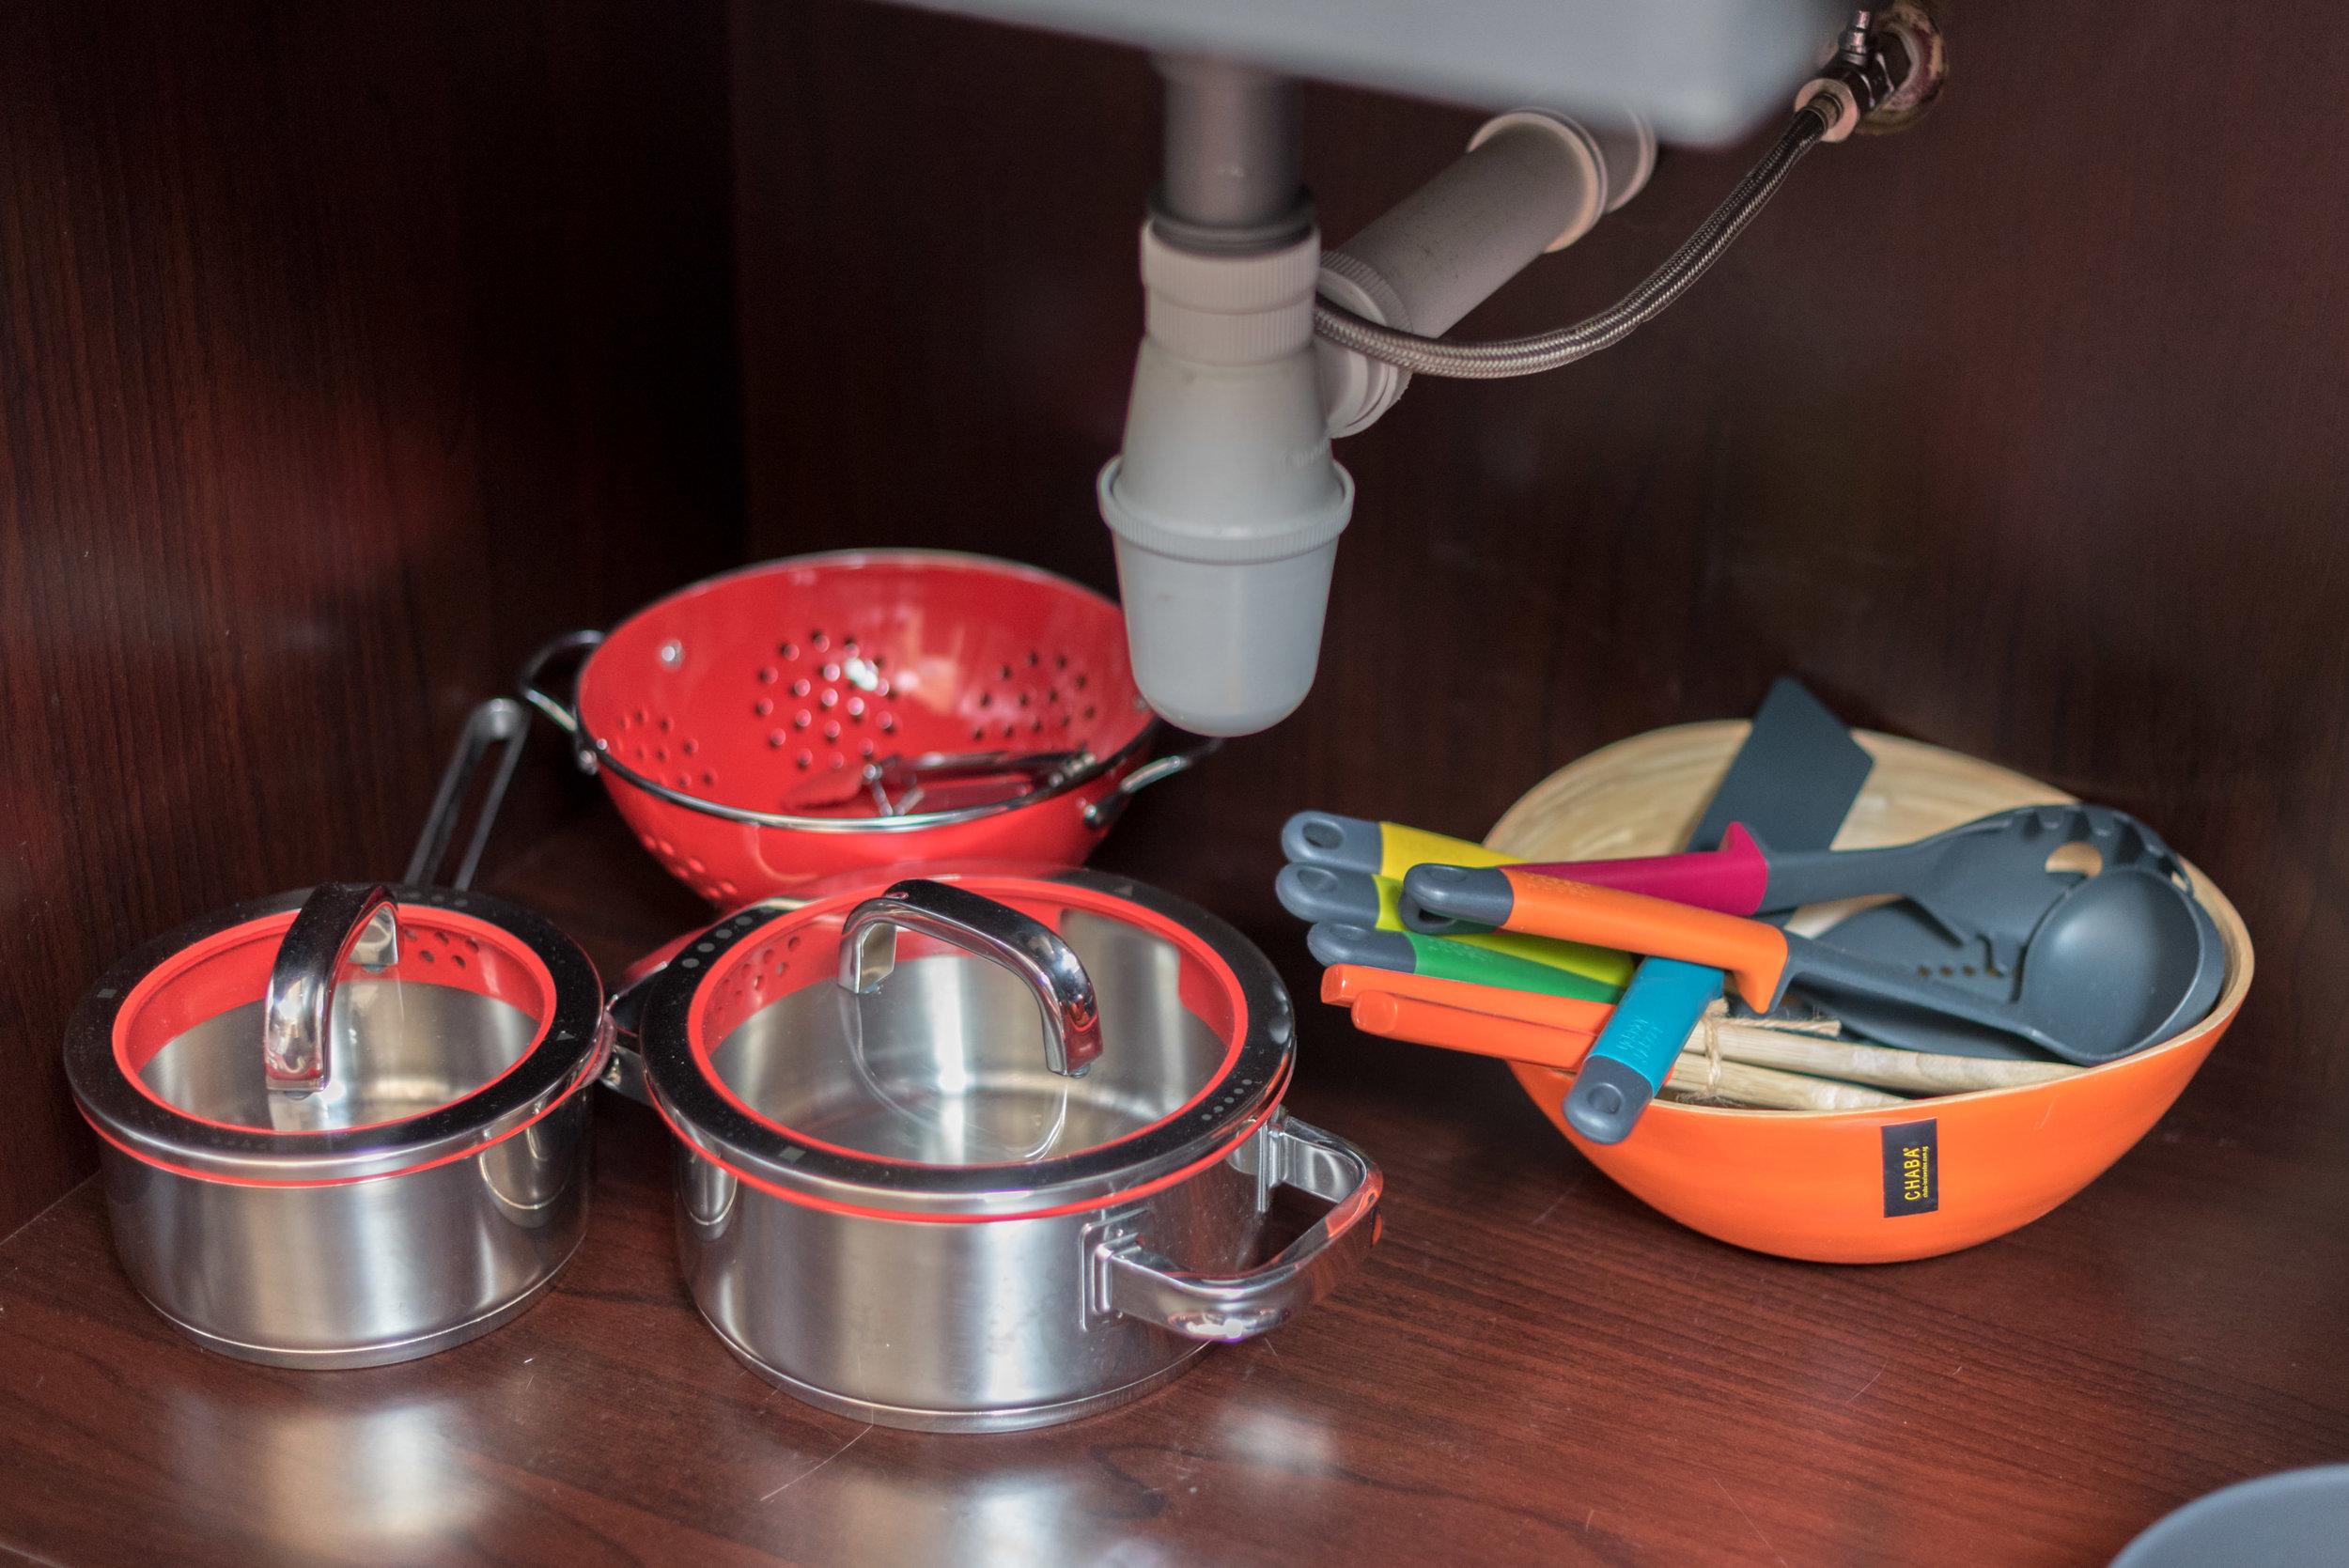 Kitchenette with Pots and Pans  Art Executive Club Suite - The Vagabond Club, A Tribute Portfolio Hotel, Singapore